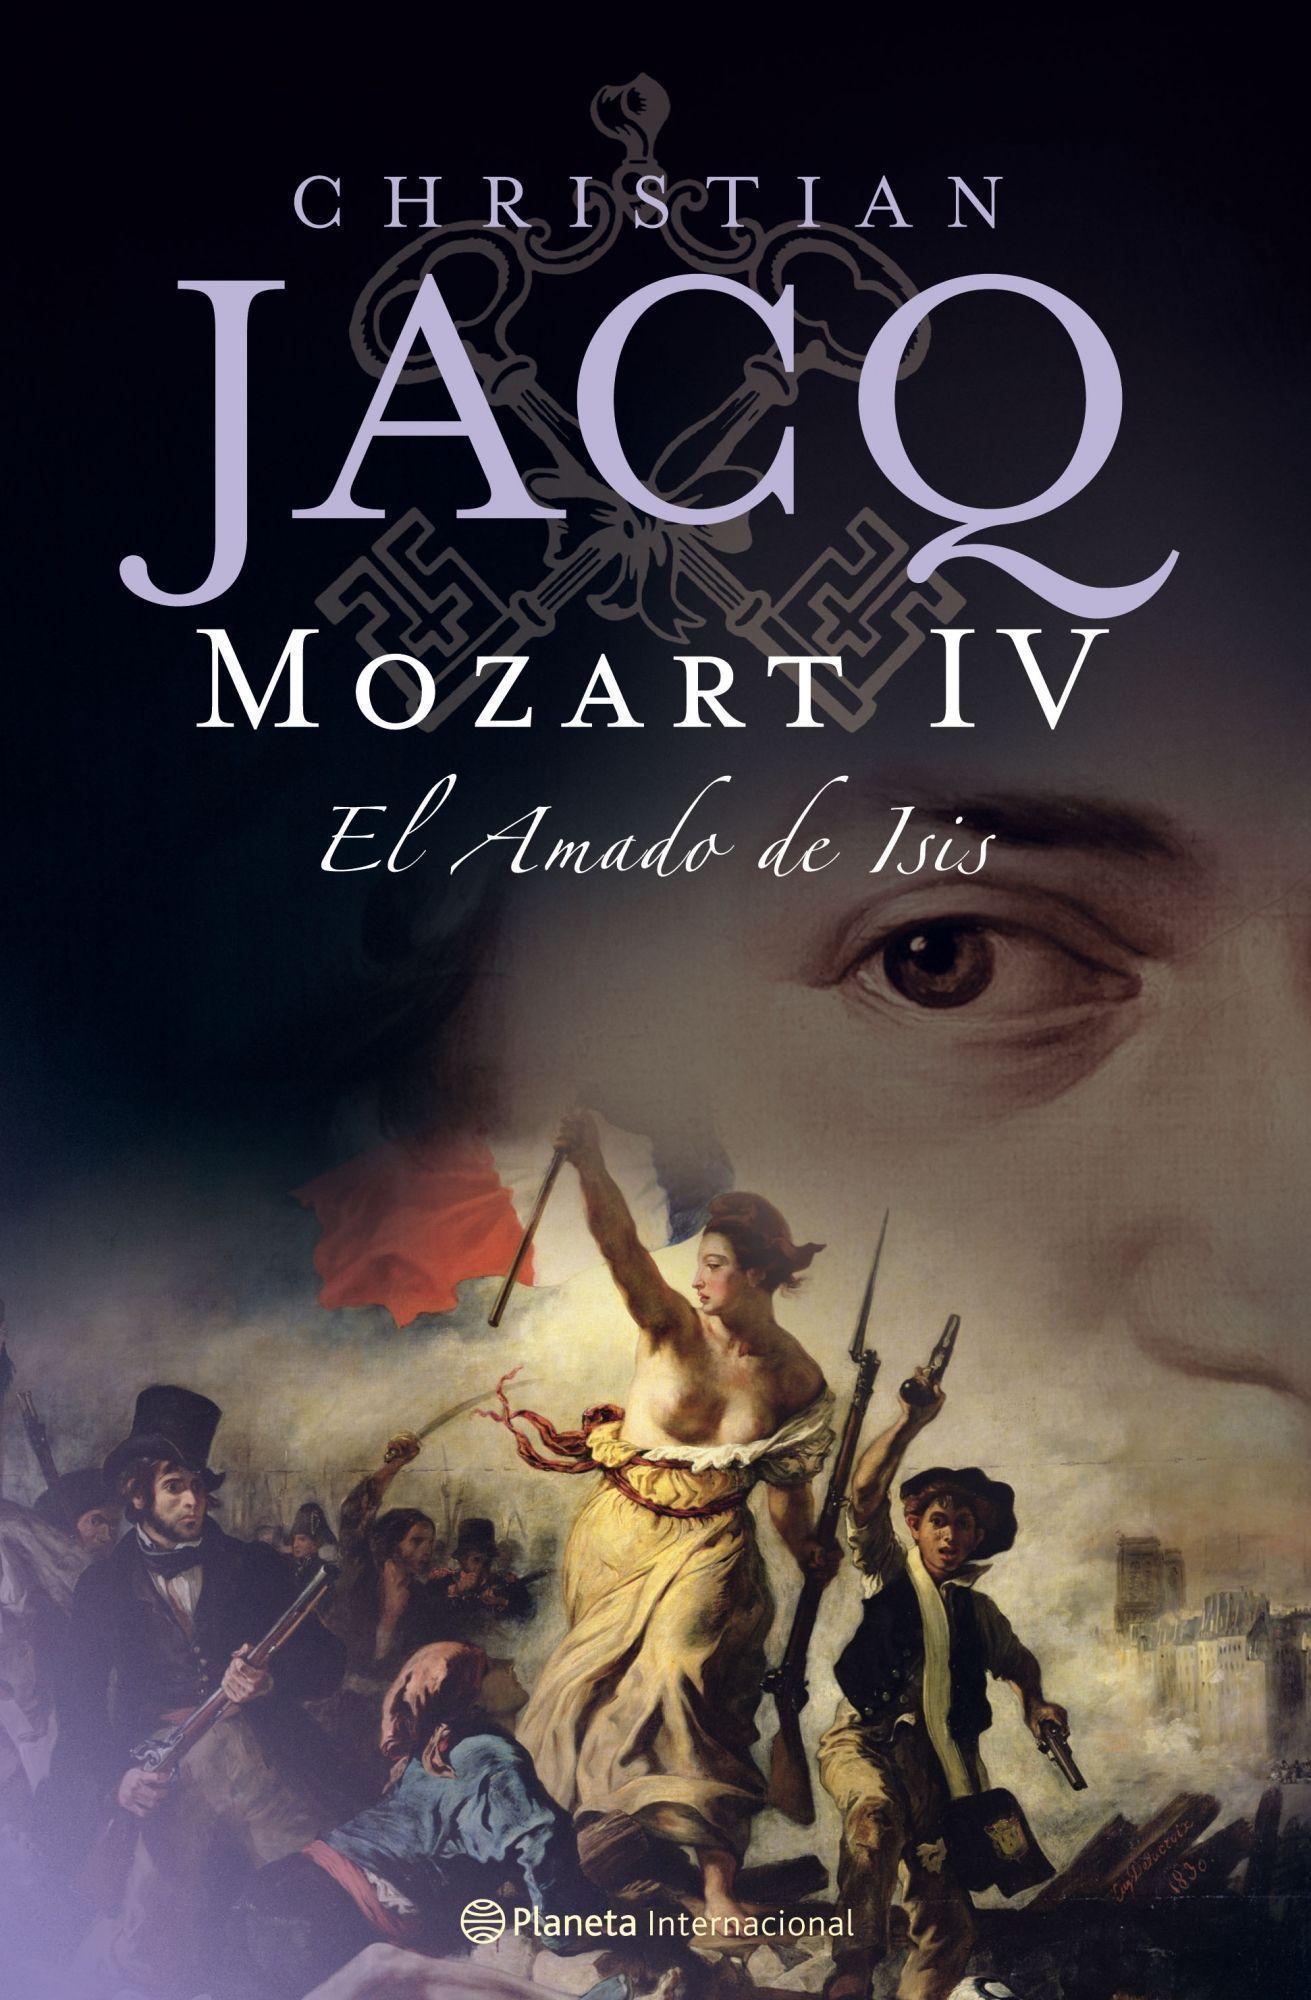 Mozart Iv: El Amado De Isis por Christian Jacq